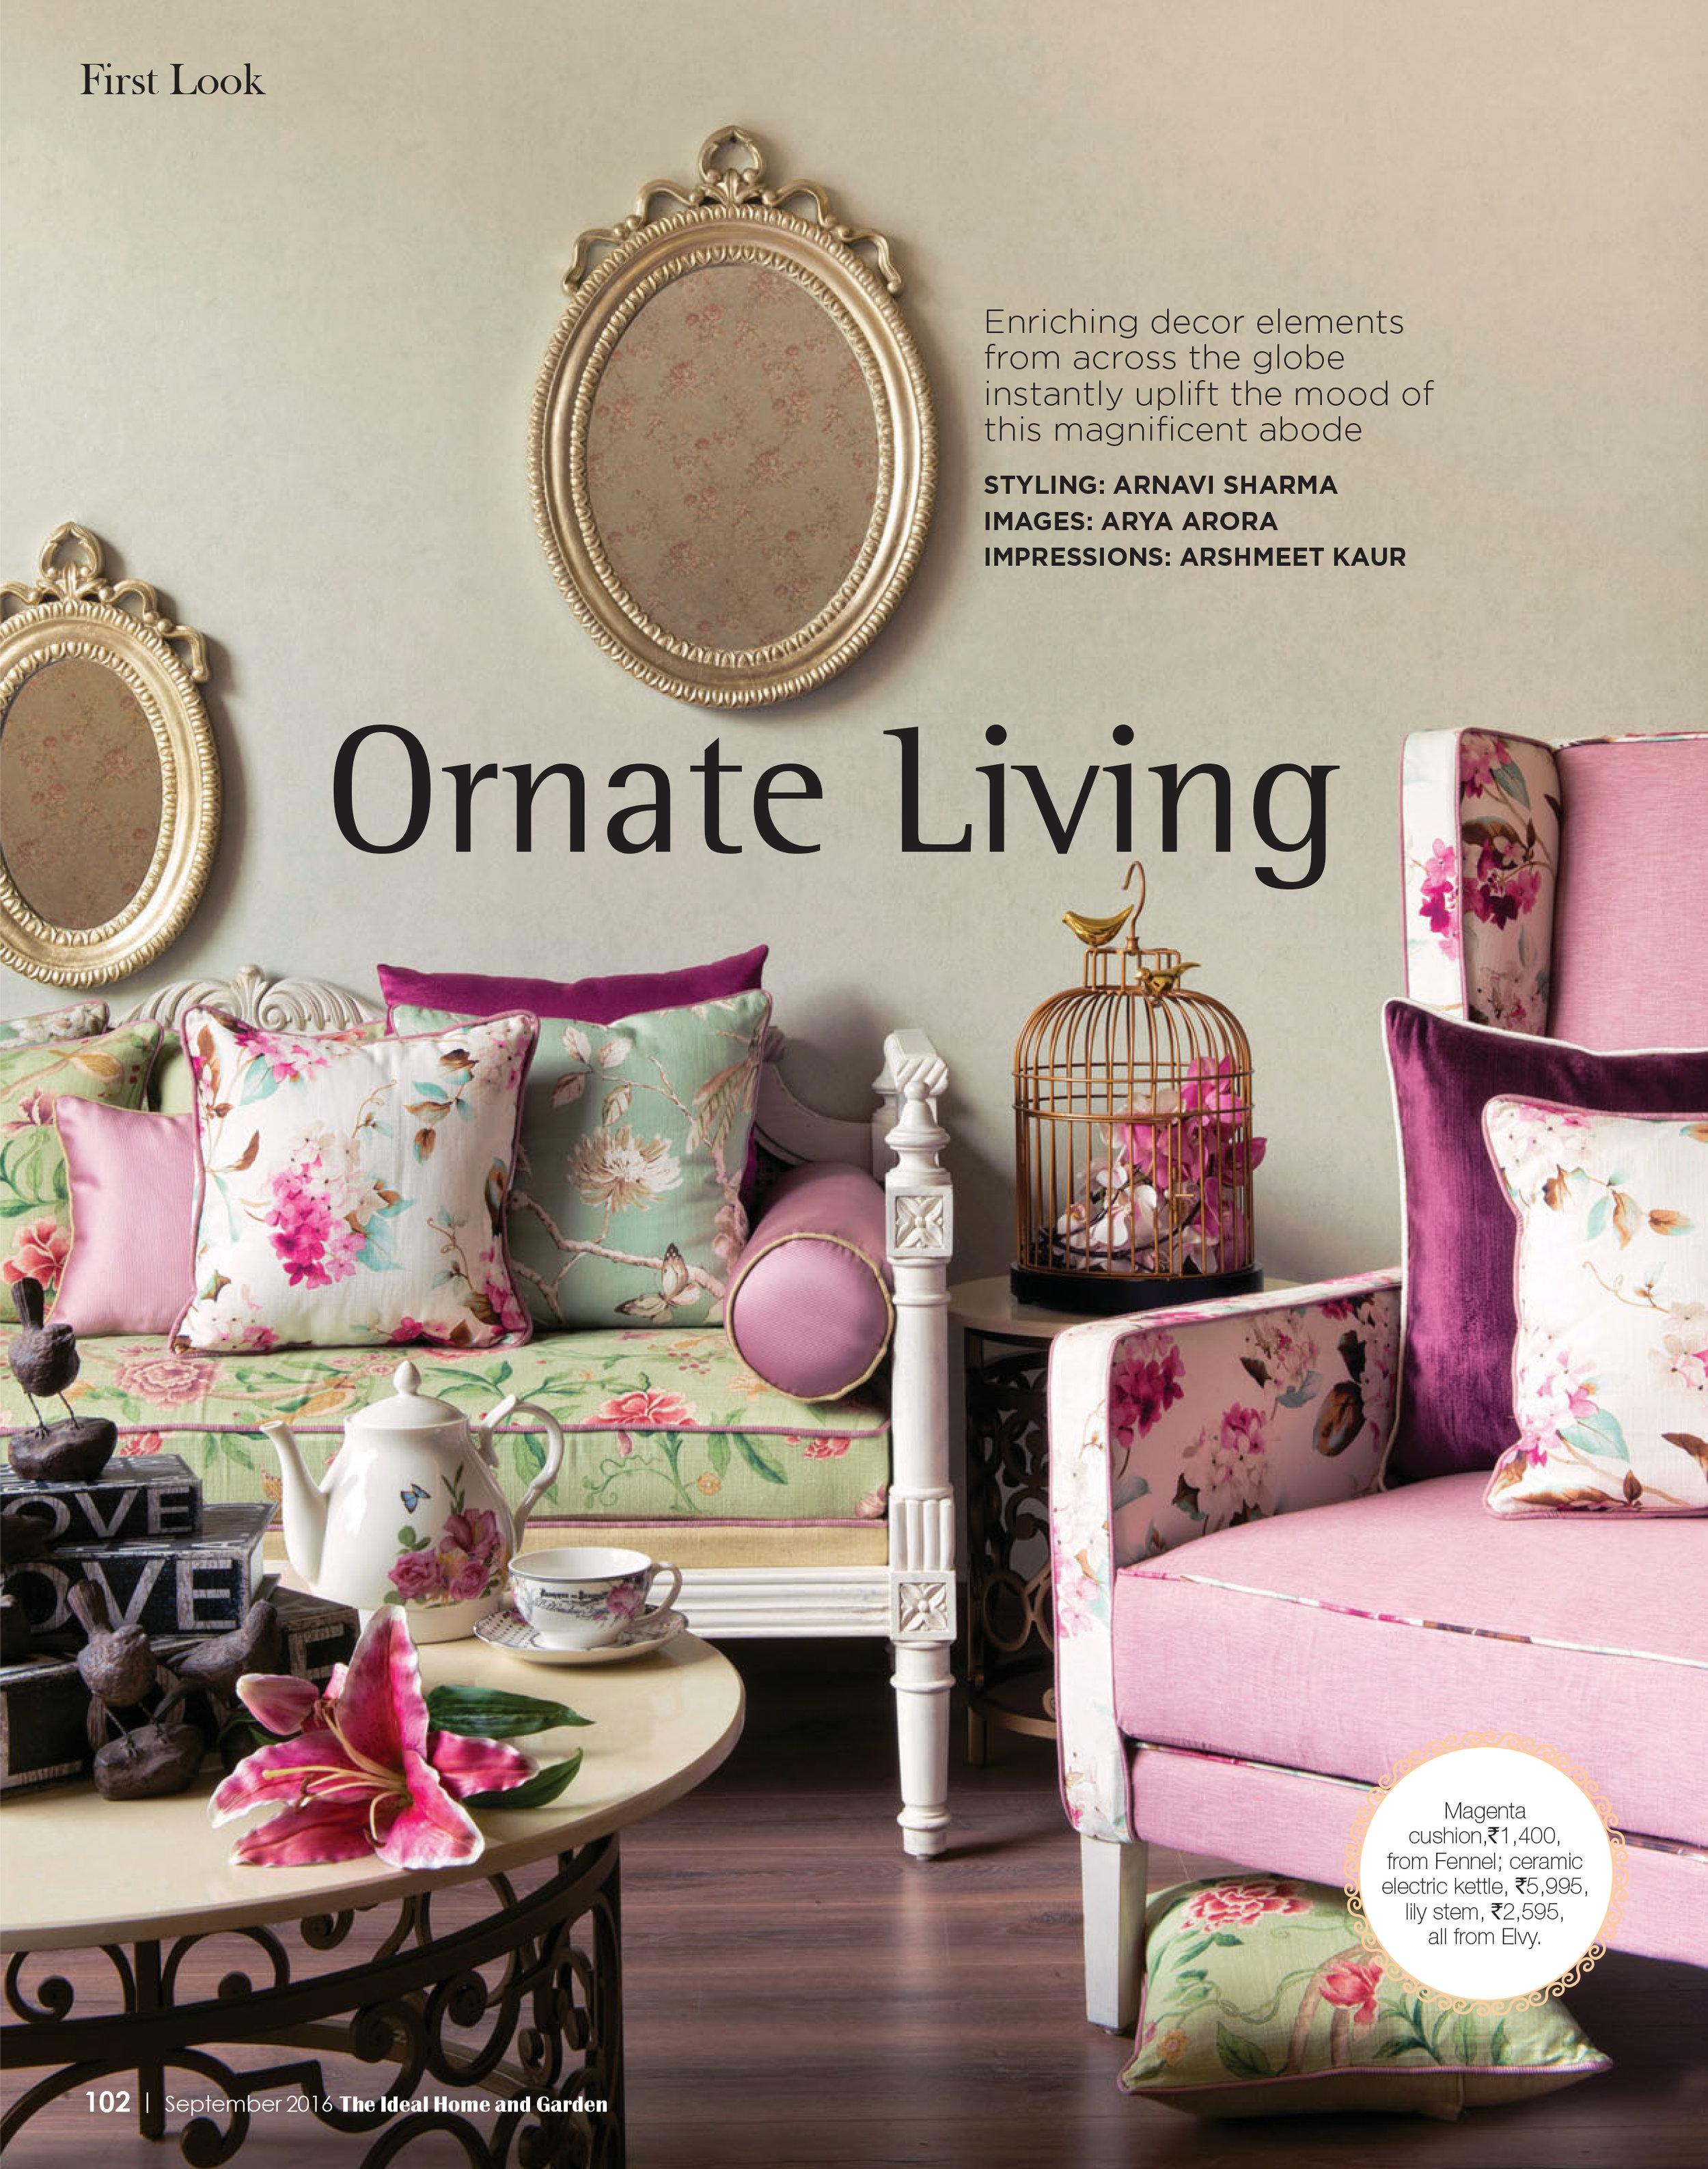 Ideal Homes - Ornate Living